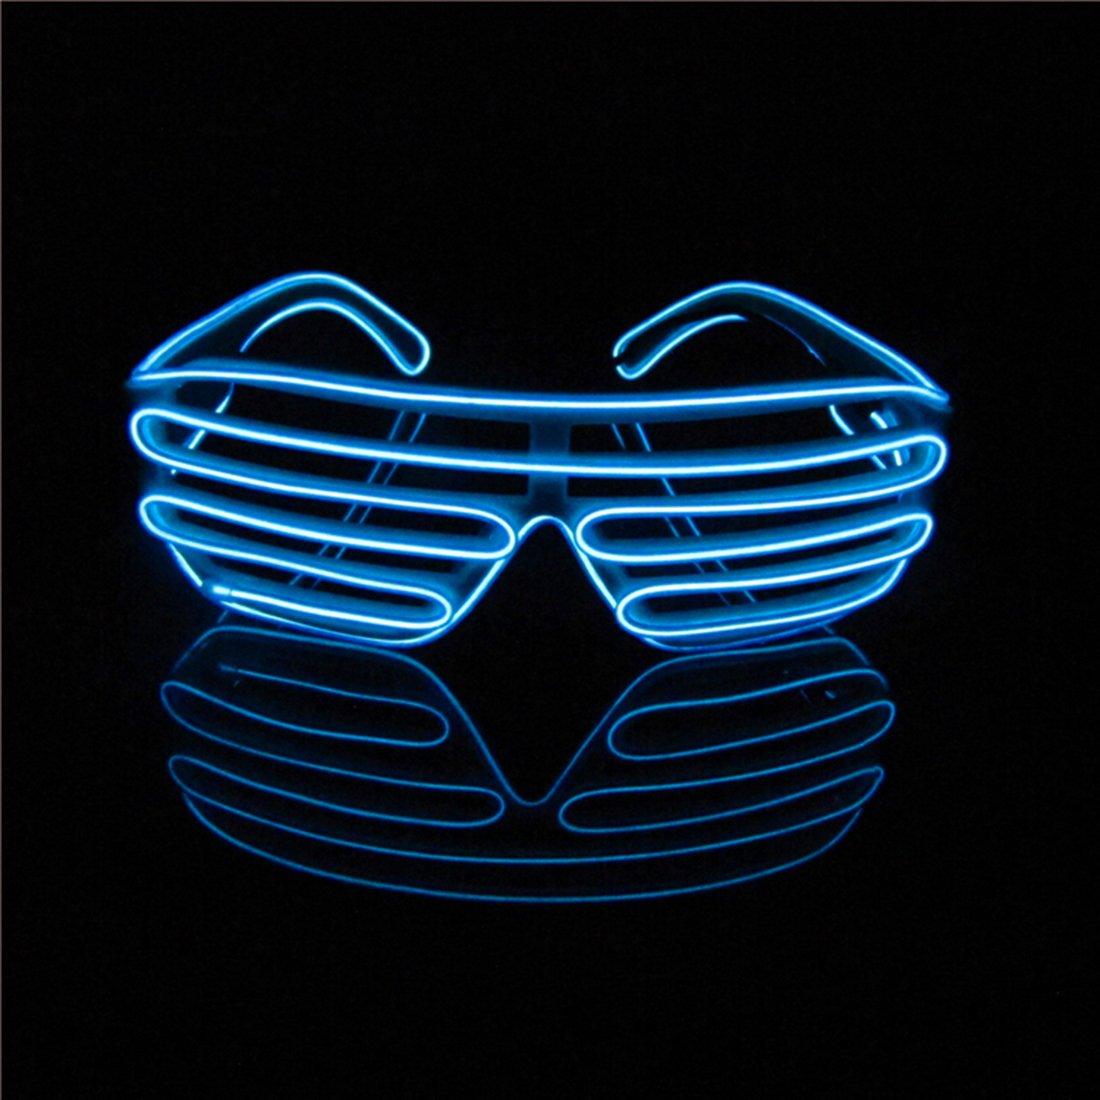 Lerway Neon El Wire LED Light Up Shutter Crazy Luminous Glasses ...